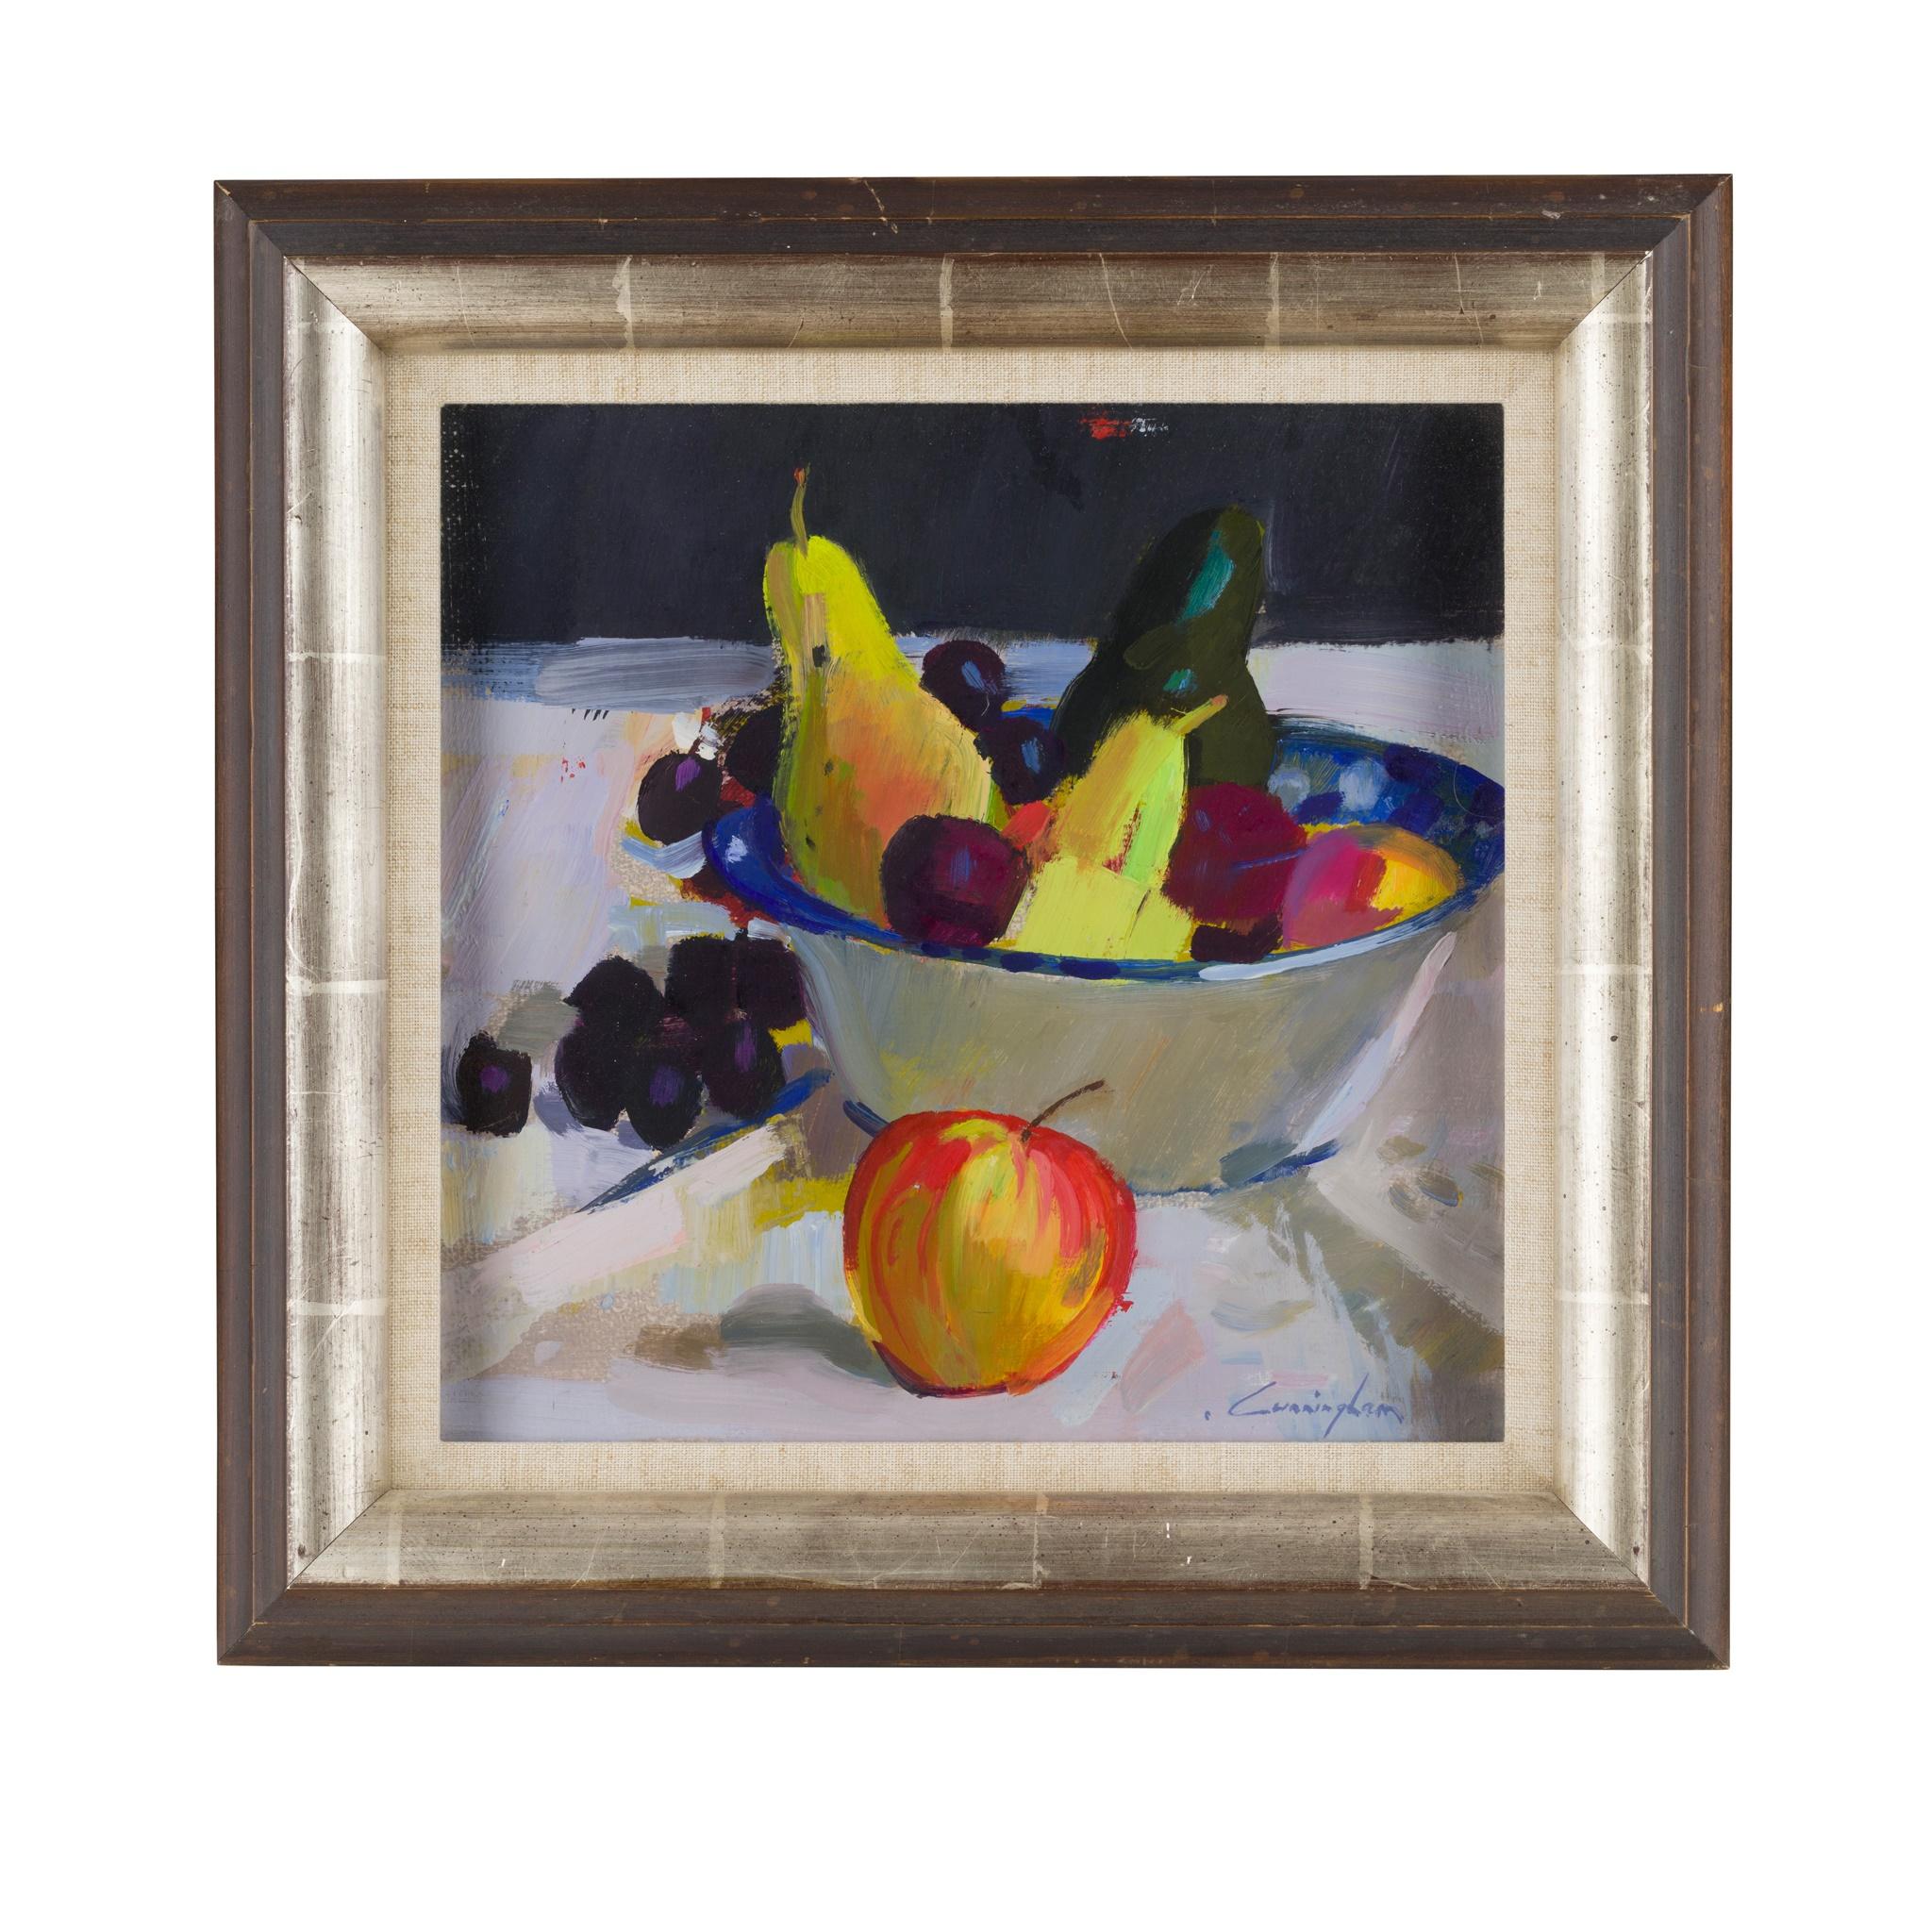 § JOHN CUNNINGHAM (SCOTTISH 1927-2000) BOWL OF FRUIT - Image 2 of 3